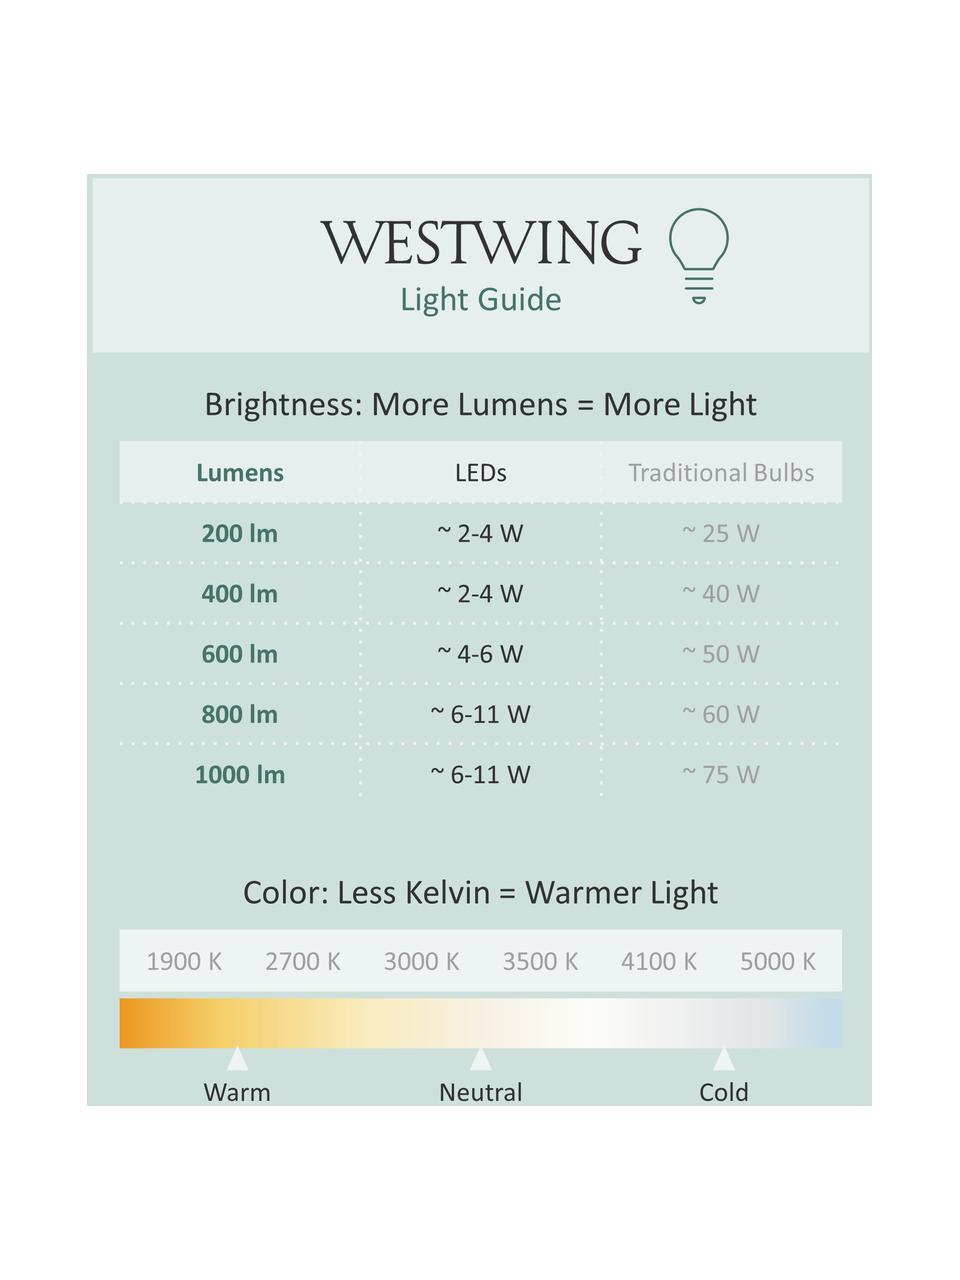 E14 Leuchtmittel, 250lm, warmweiß, 5 Stück, Leuchtmittelschirm: Glas, Leuchtmittelfassung: Aluminium, Transparent, Ø 4 x H 10 cm